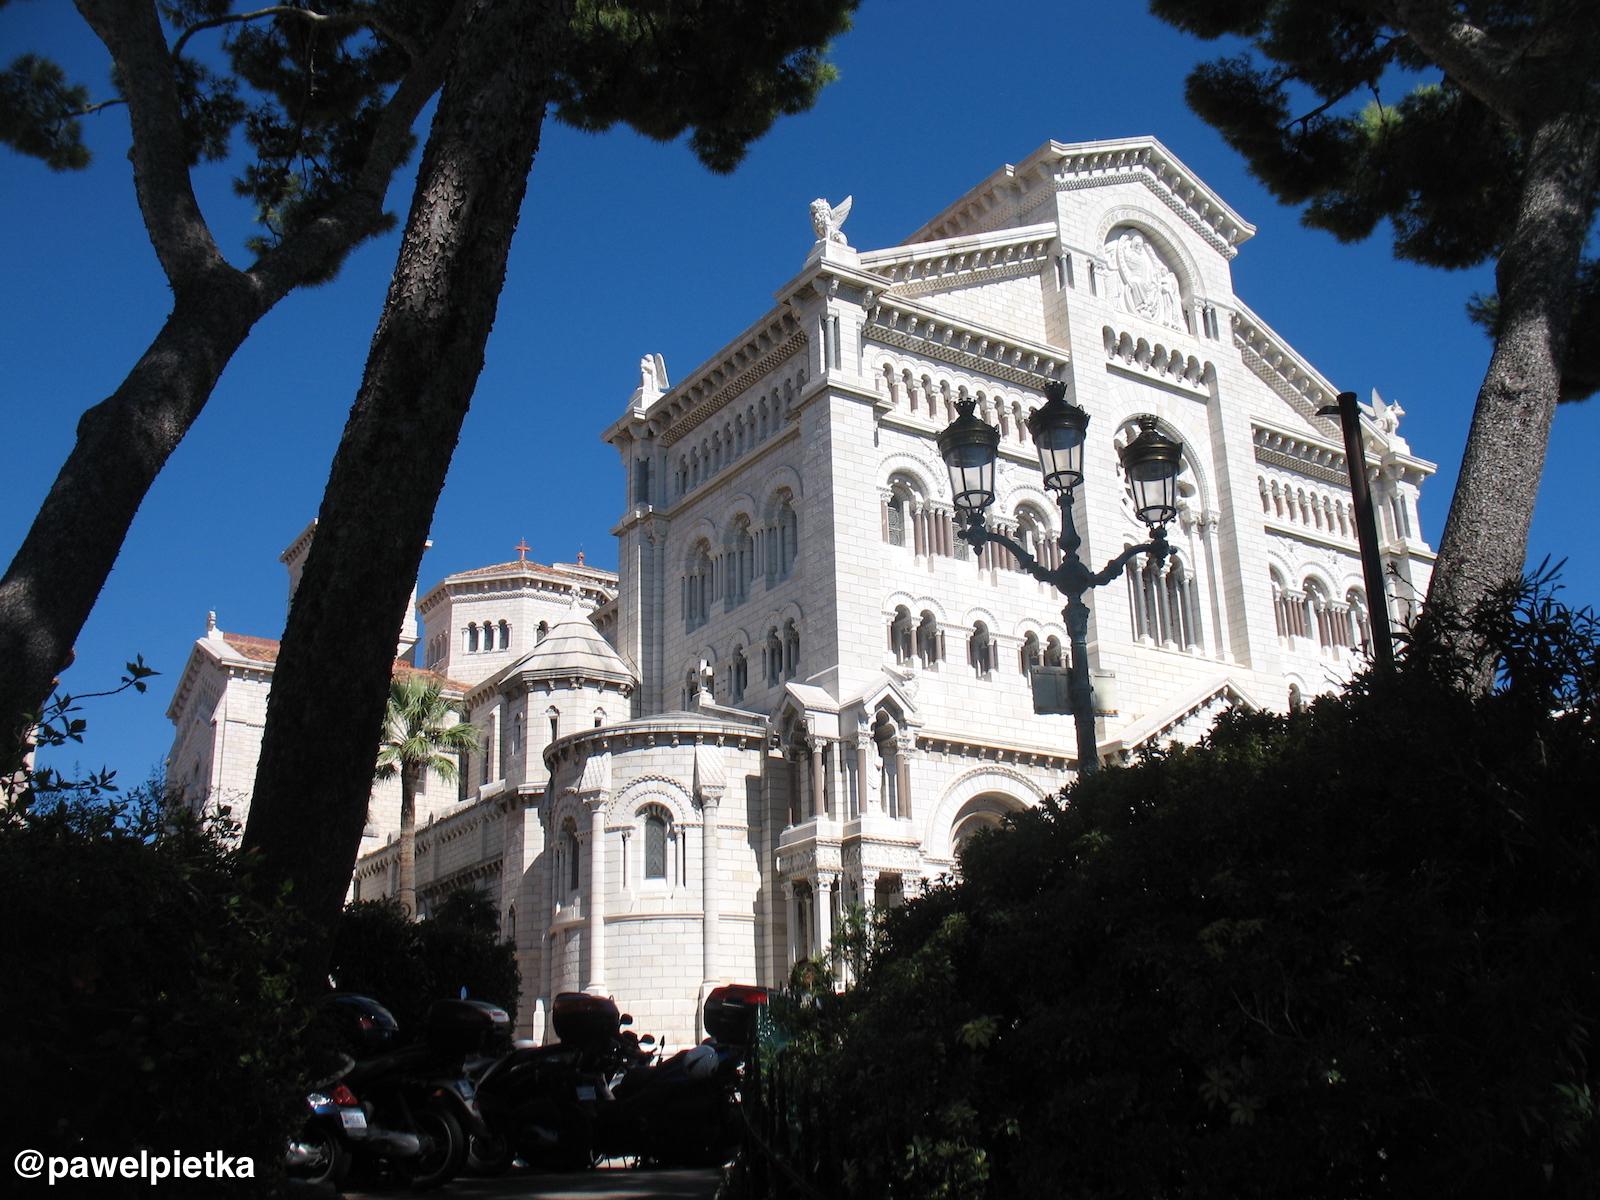 9 Monako Katedra sw Michala